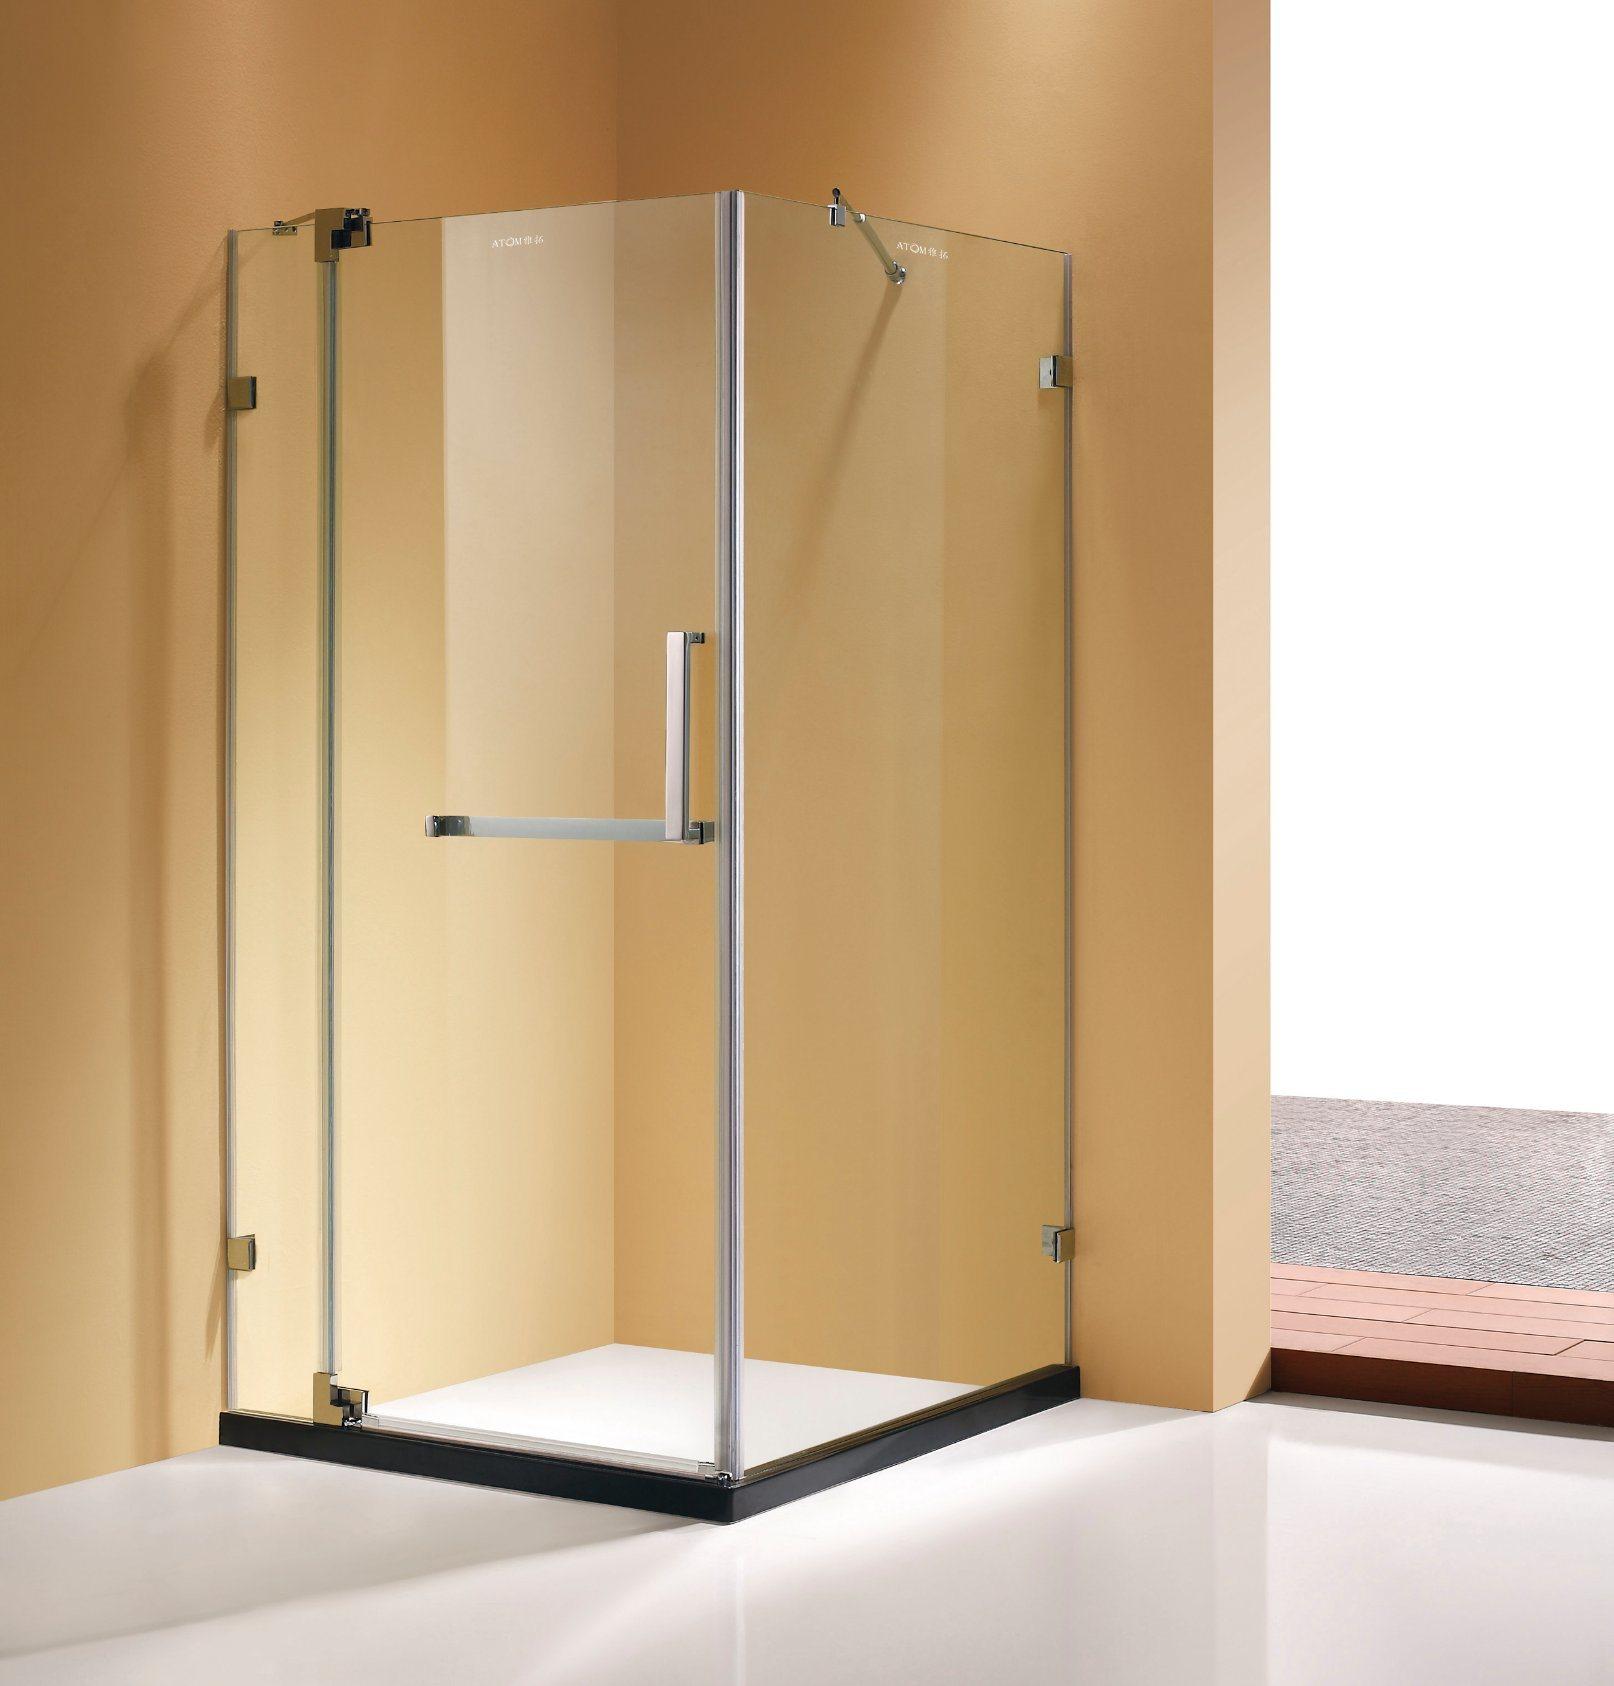 Hot Item Brushed Nickel Finish Frameless Pivot Shower Enclosure 3 8 Glass